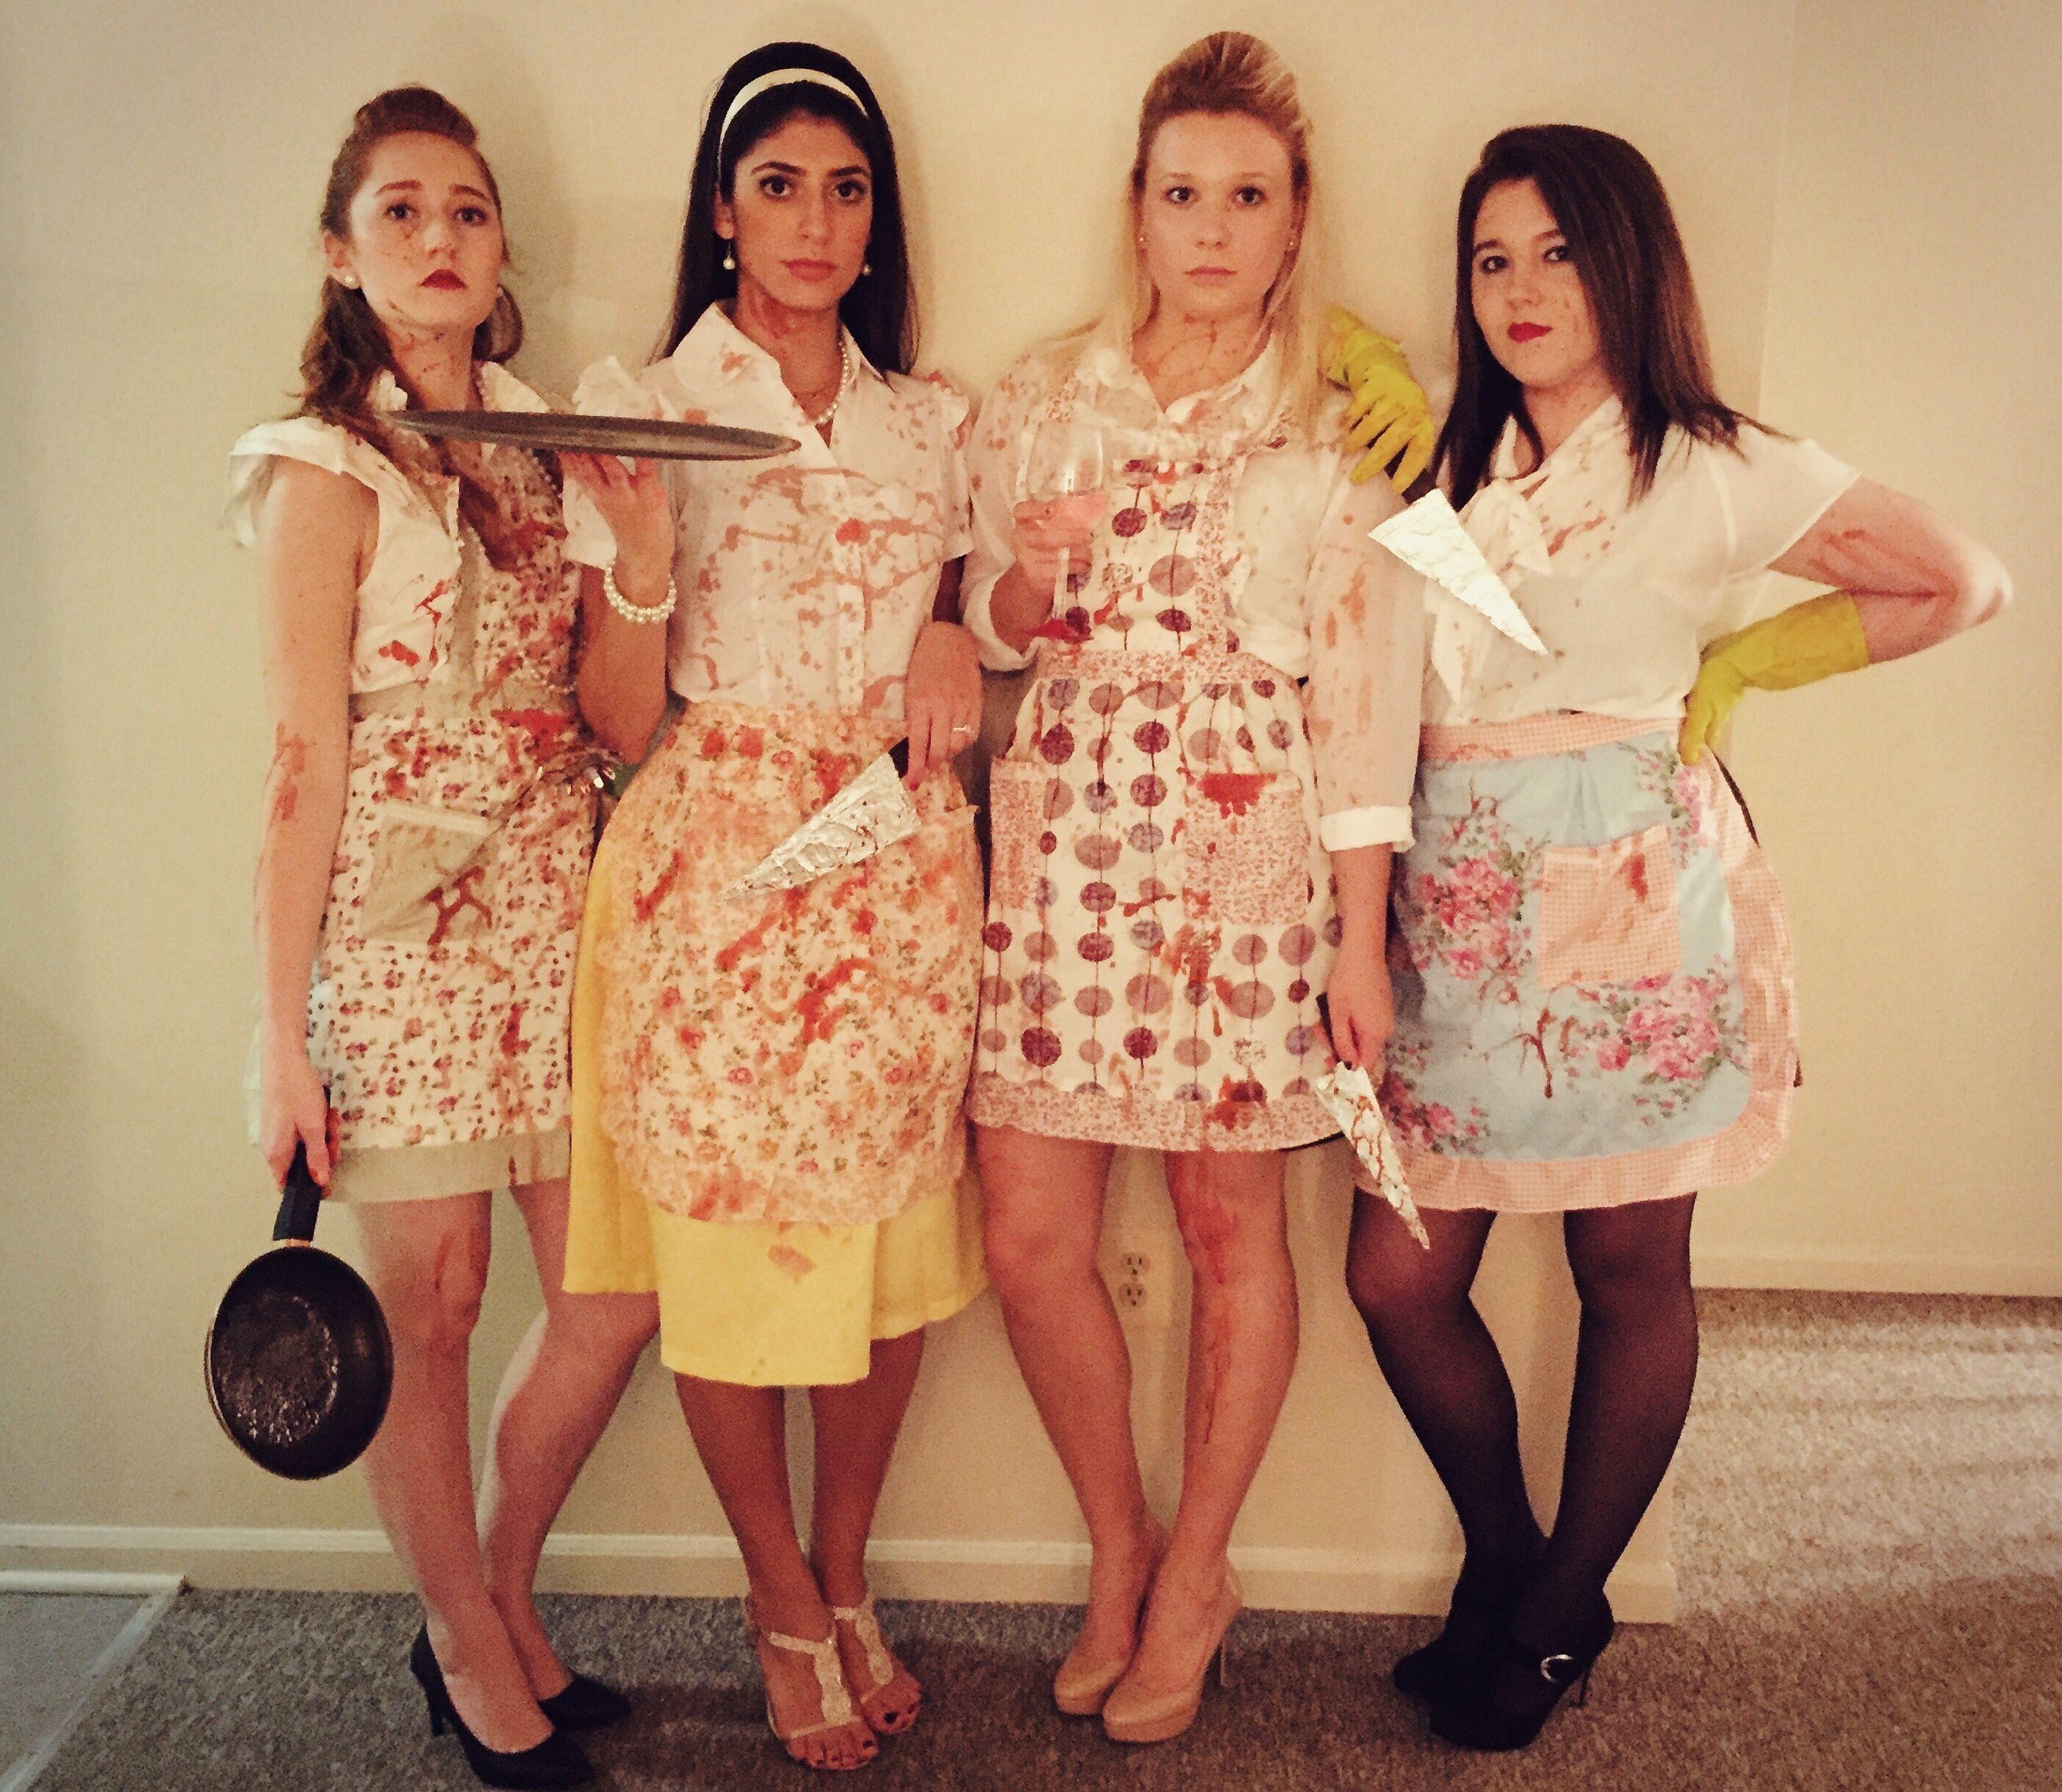 Halloween Costume, DIY Murderous Housewives, College Costumes ...